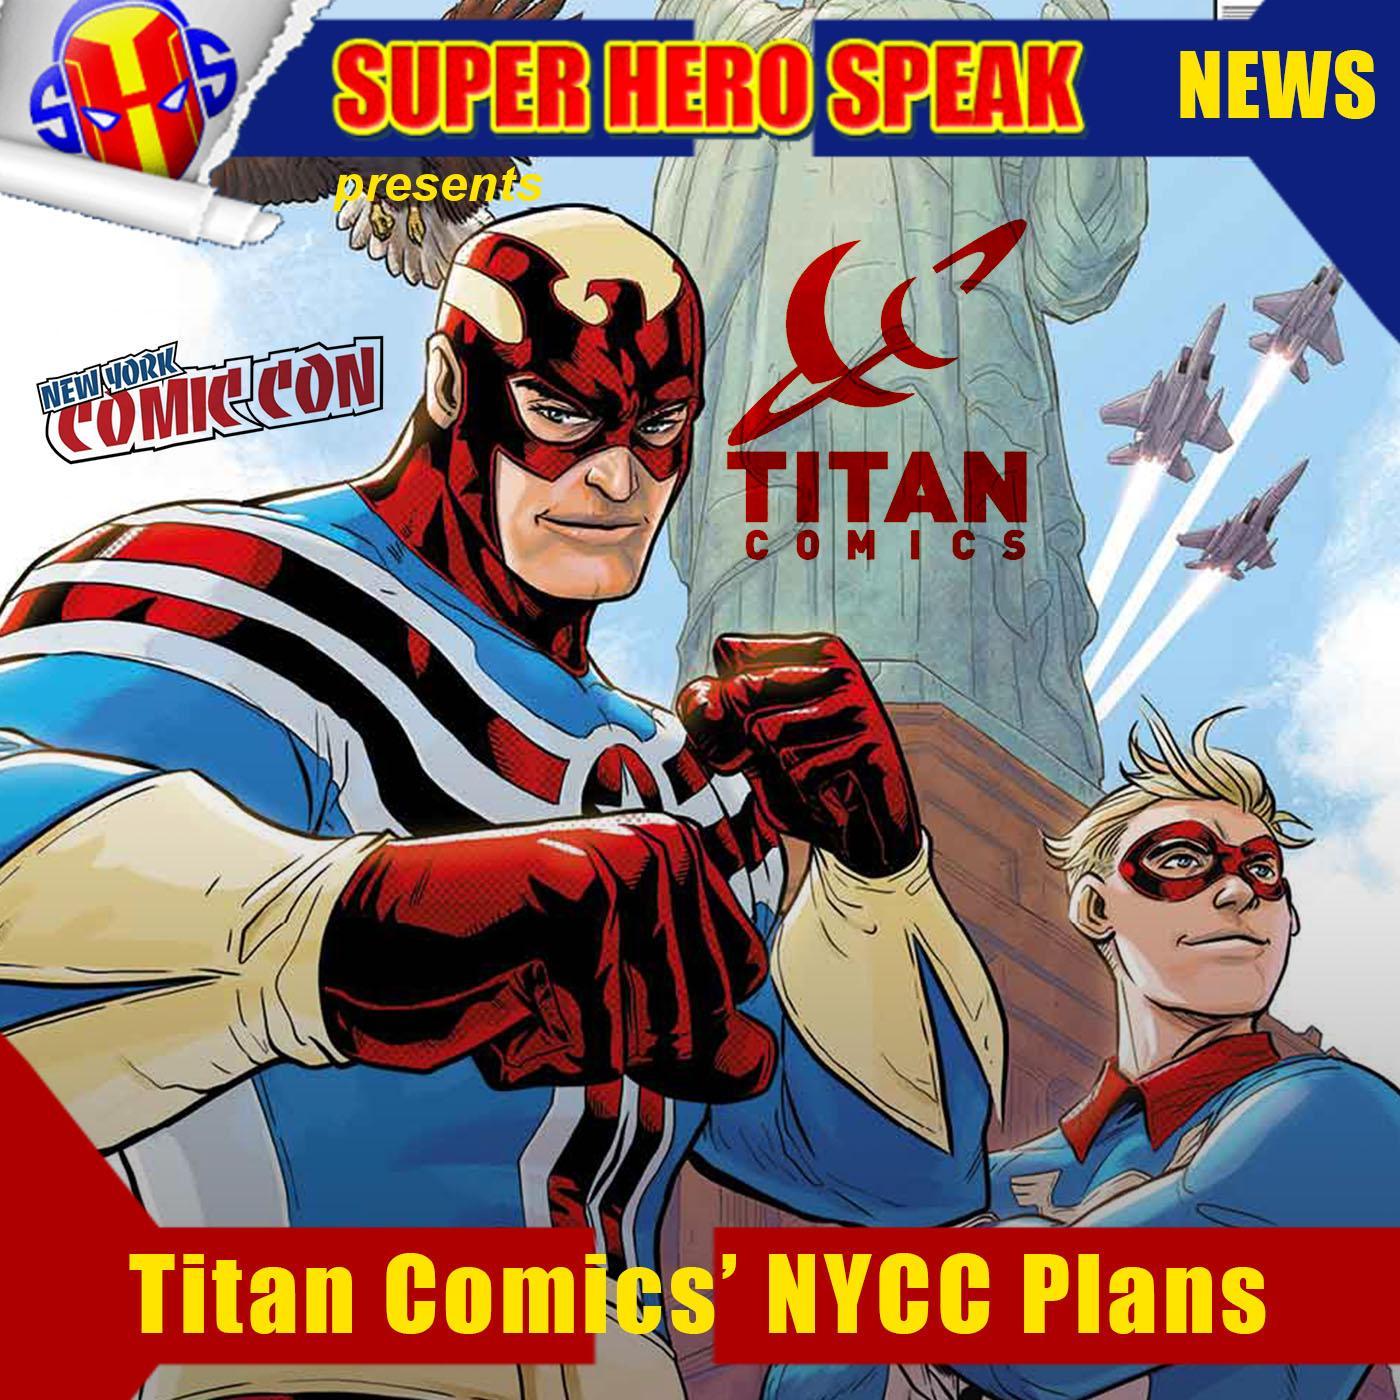 FULL PLANS REVEALED: TITAN COMICS AT NEW YORK COMIC CON 2017